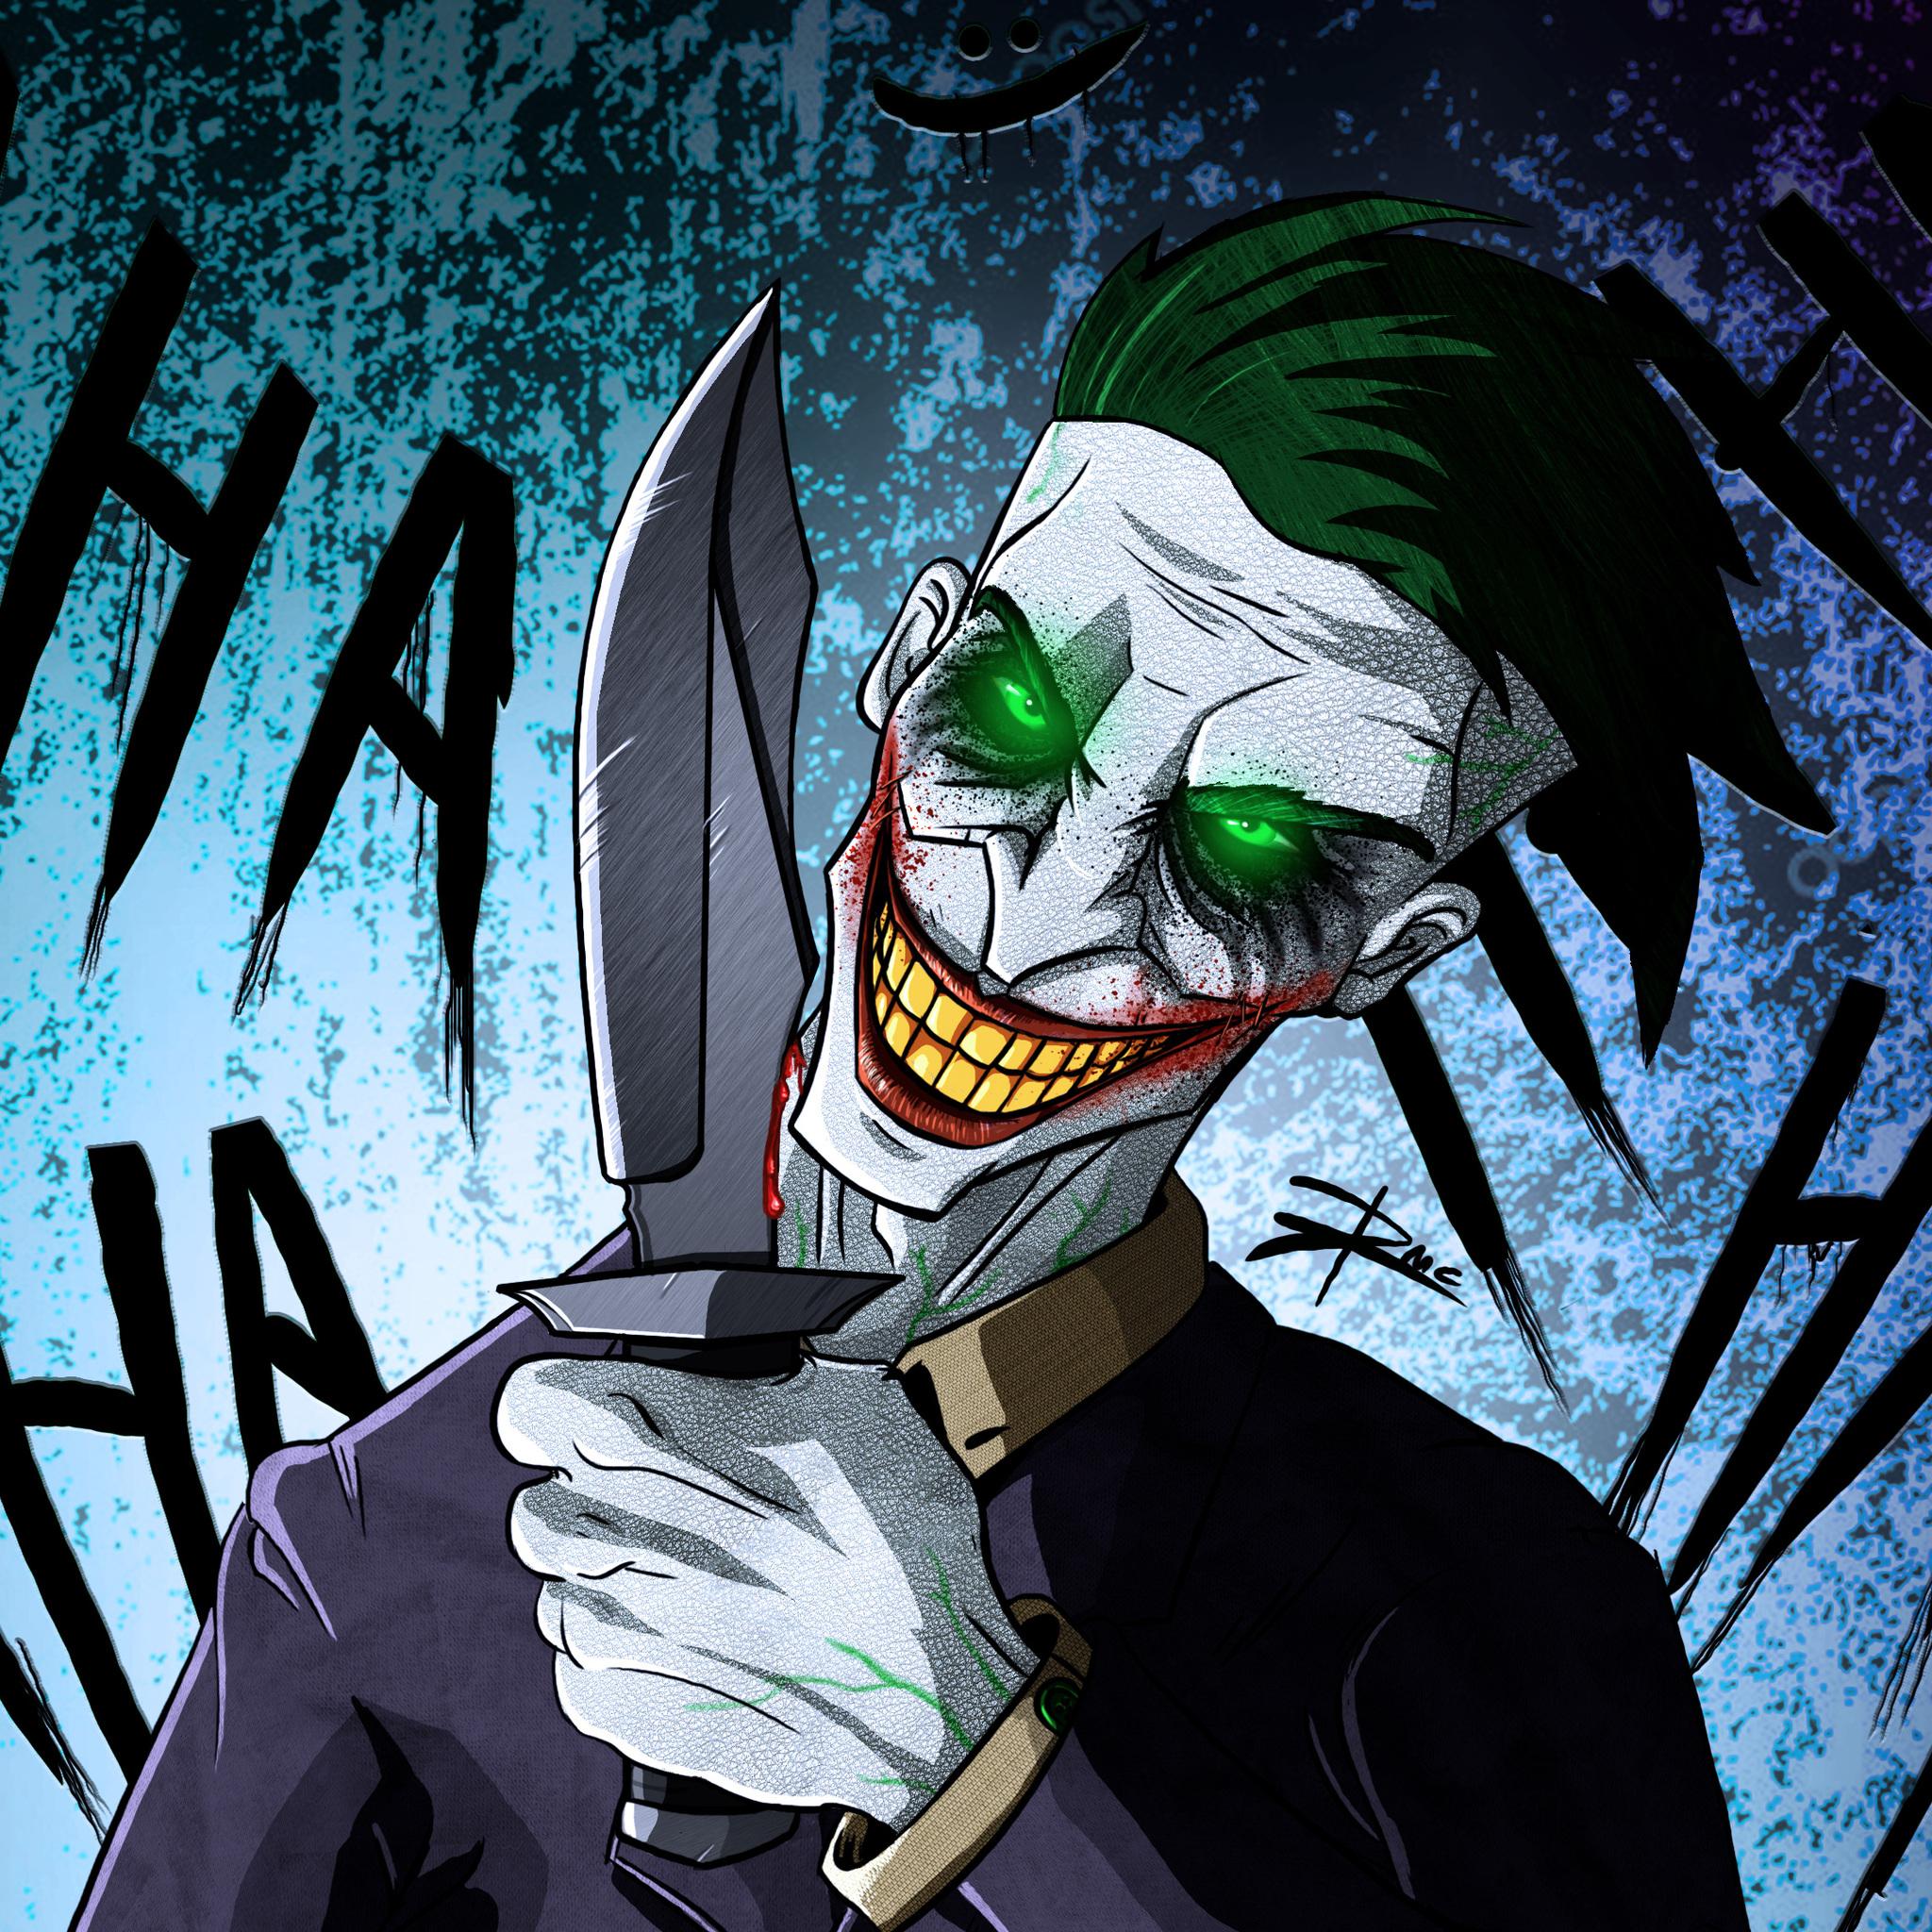 2048x2048 Crazy Joker Art 4k Ipad Air HD 4k Wallpapers ...